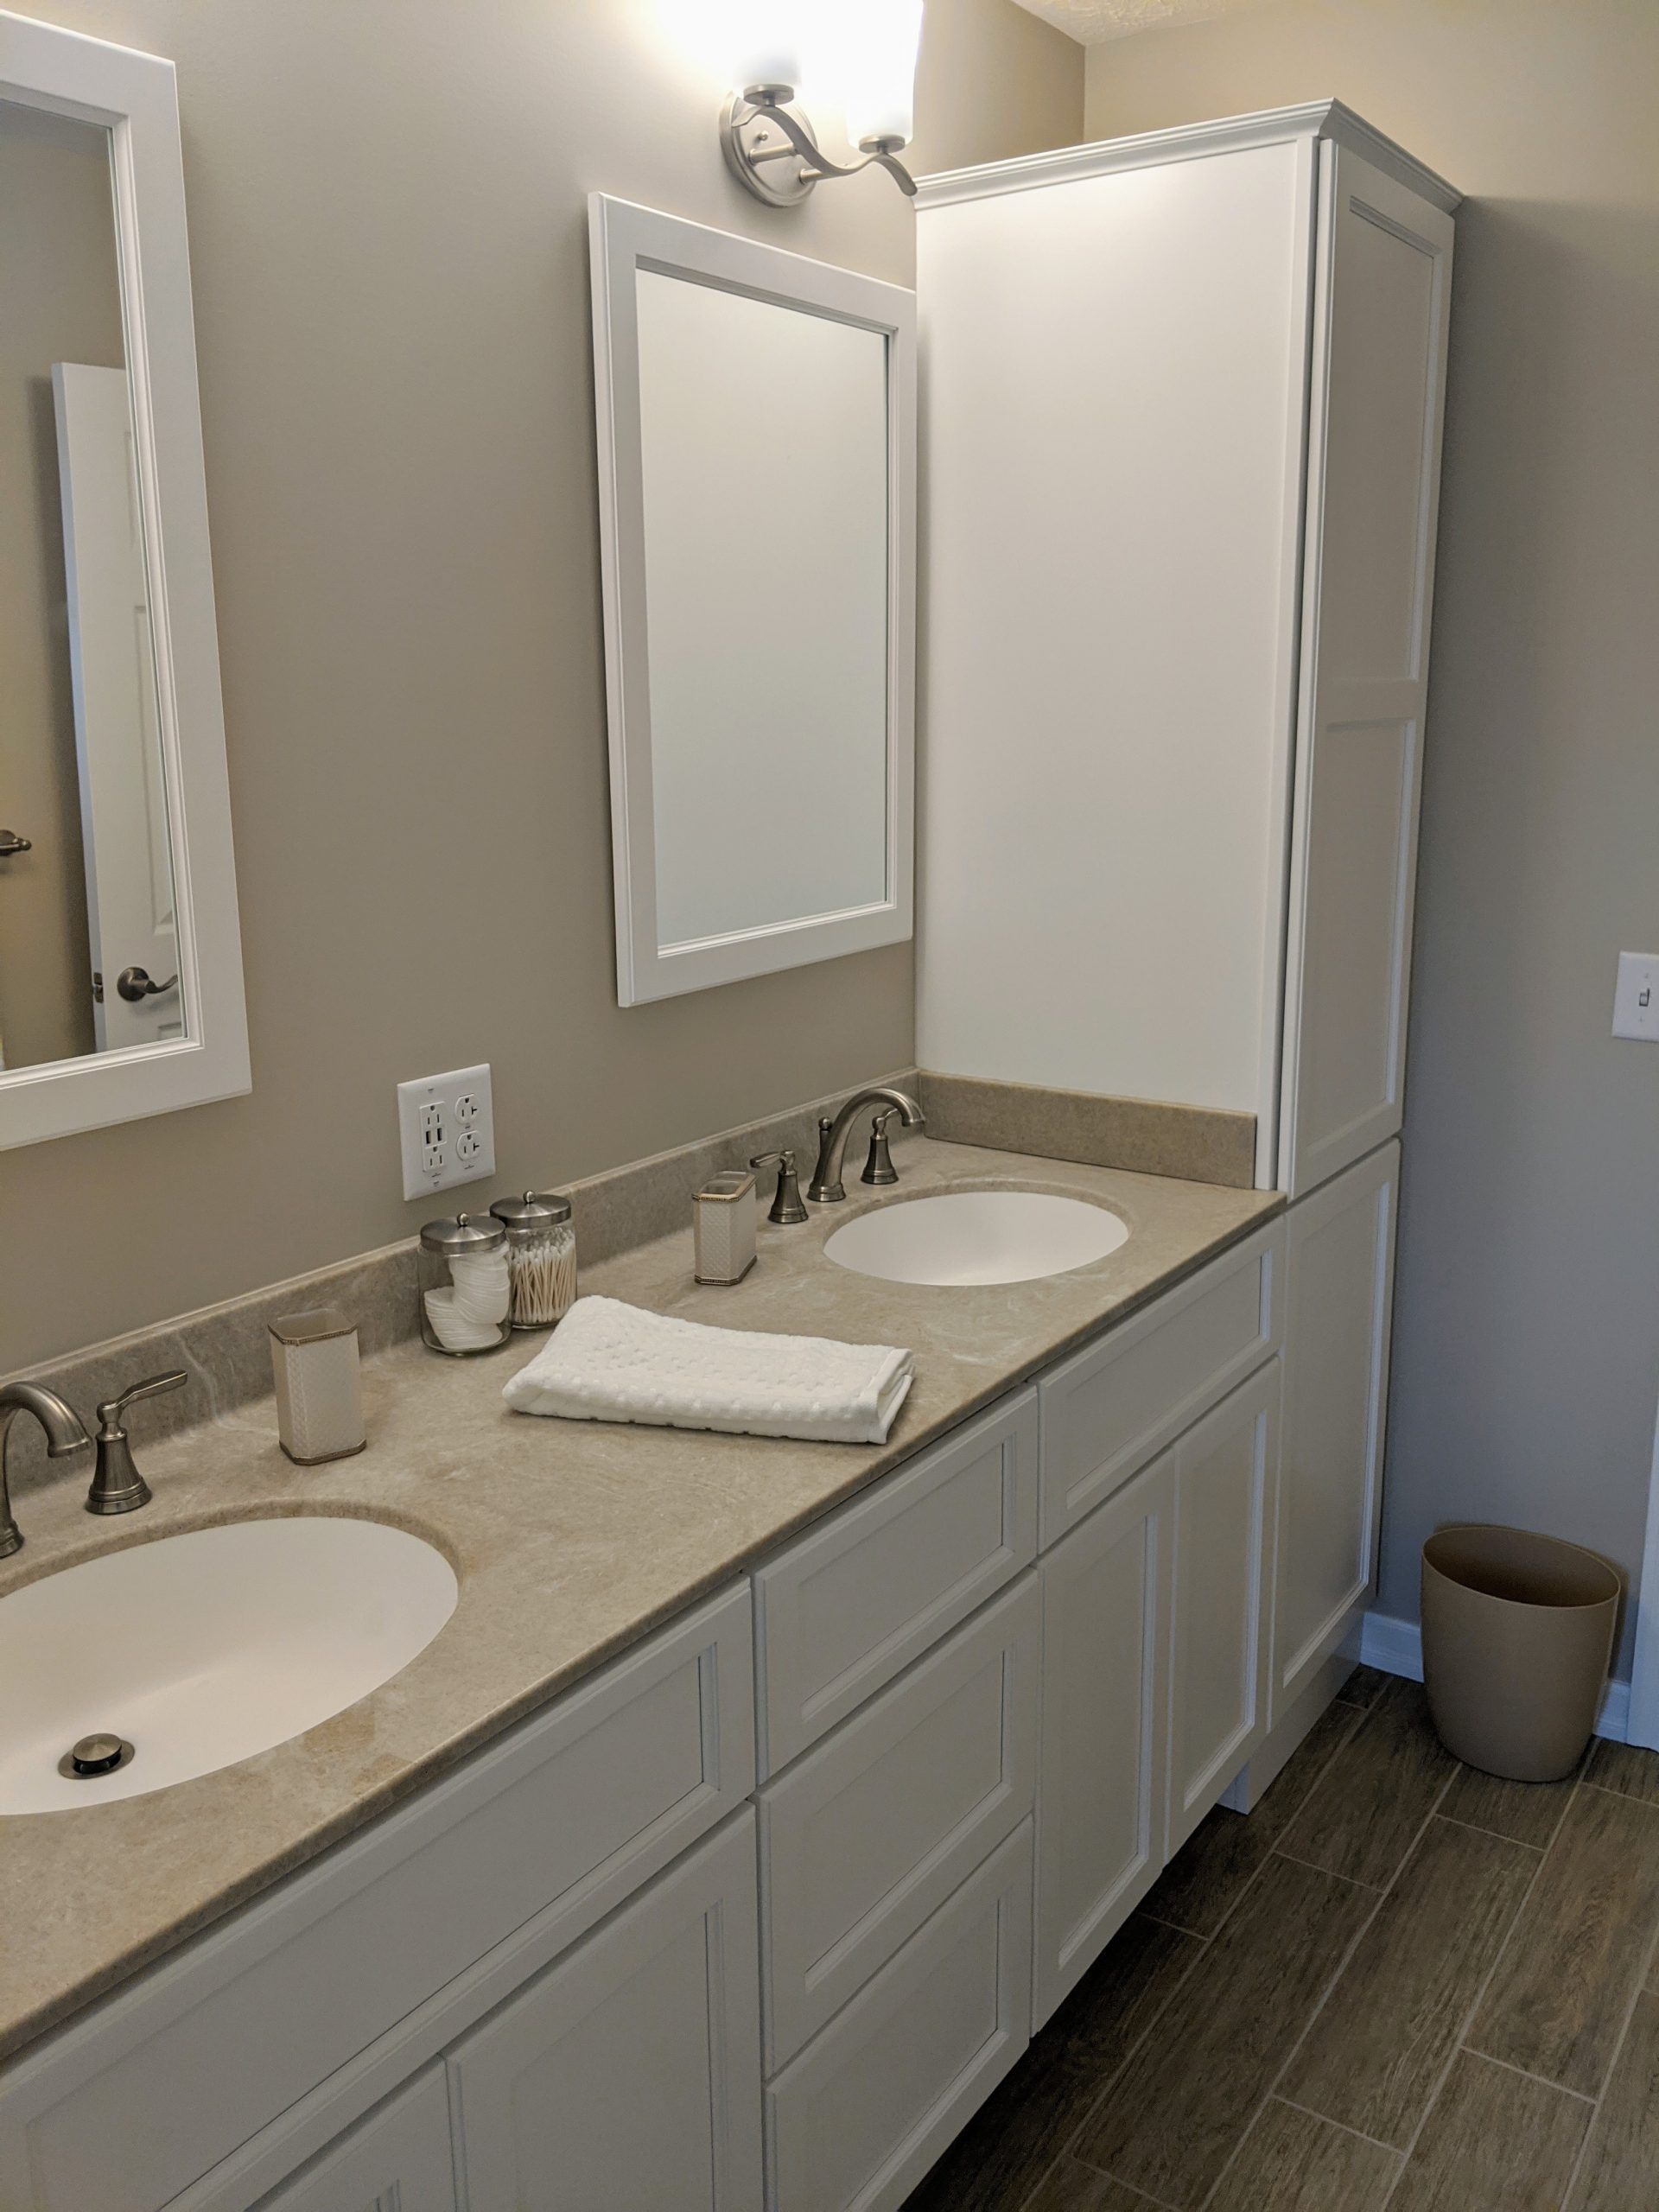 McLaughlin bathroom 3